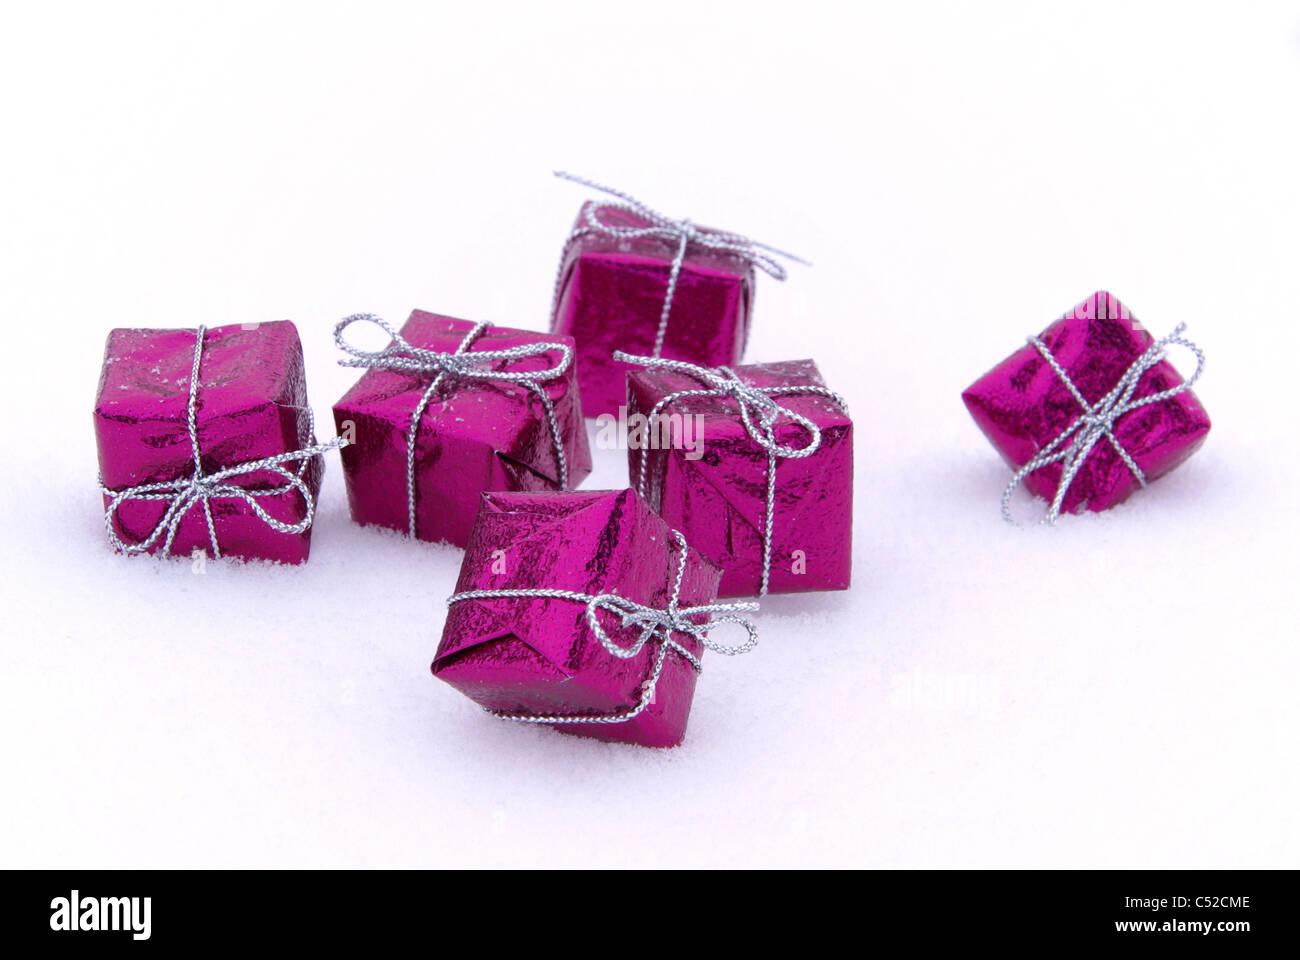 Geschenk im Schnee - gift in snow 01 - Stock Image